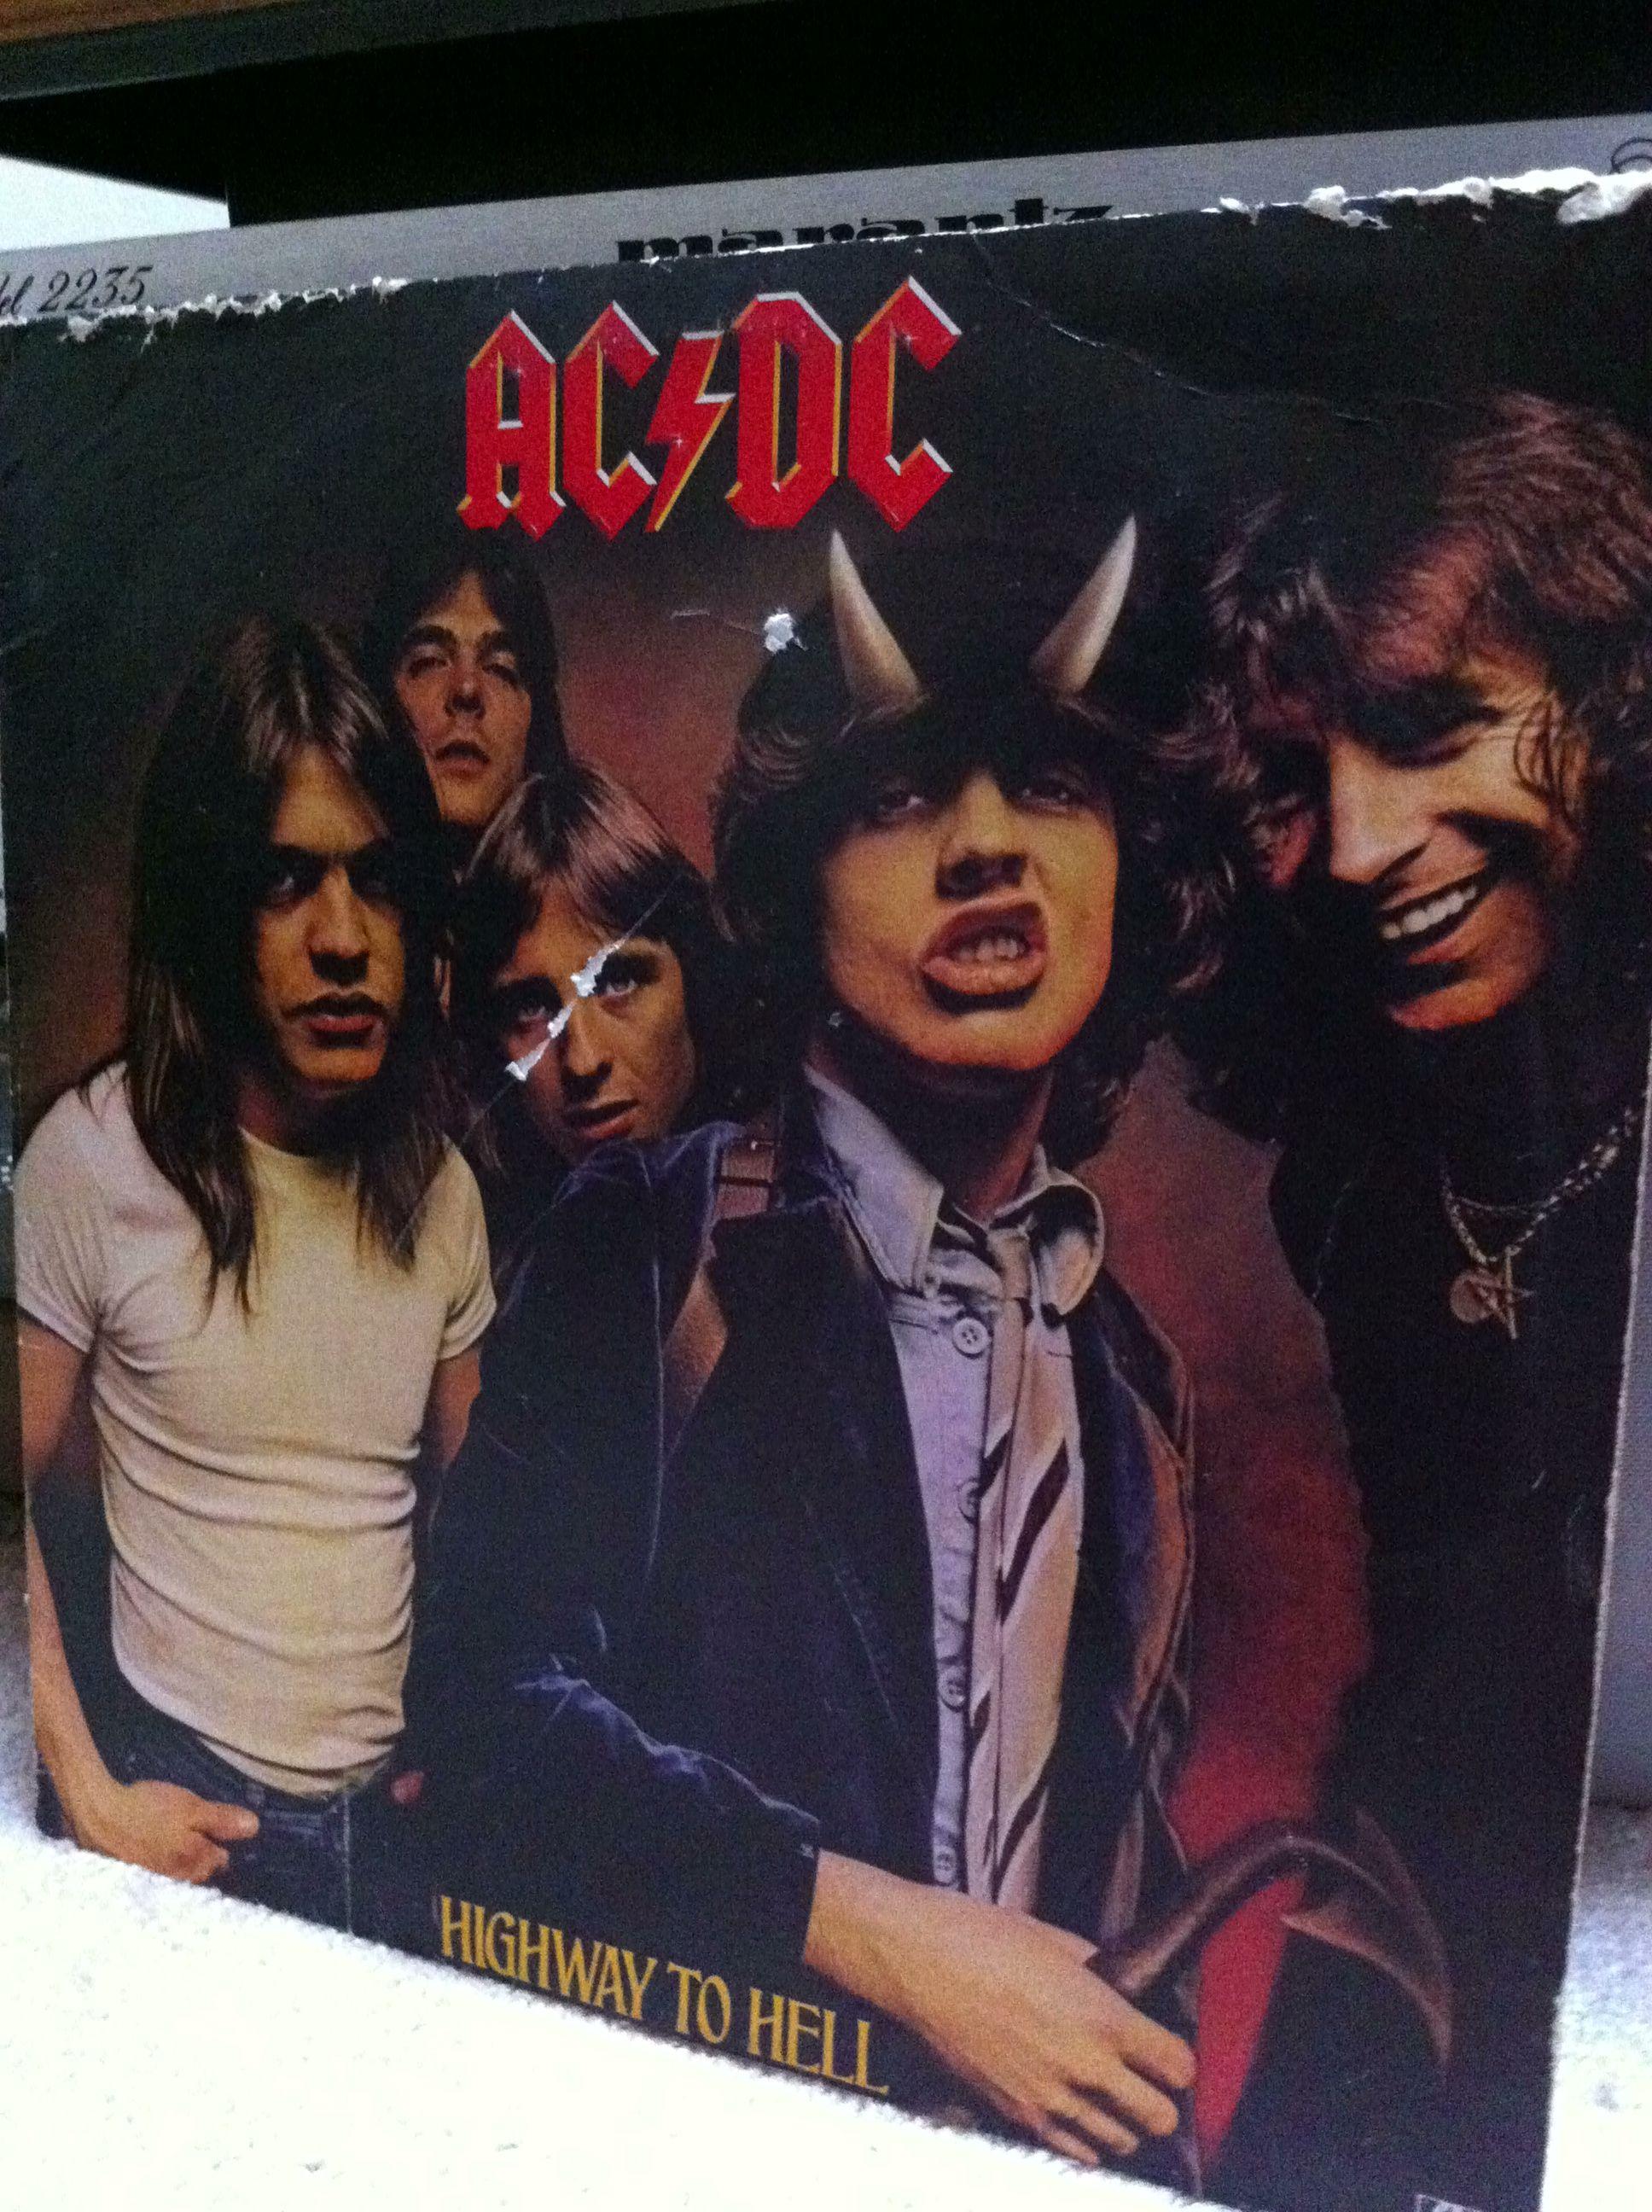 Snake Oil Recording's Morning Listening - AC/DC - Highway To Hell   #rva #rvamusic #recording #vinyl #studio #audio #records #acdc #rock #metal #classic   Http://www.snakeoilrecording.com